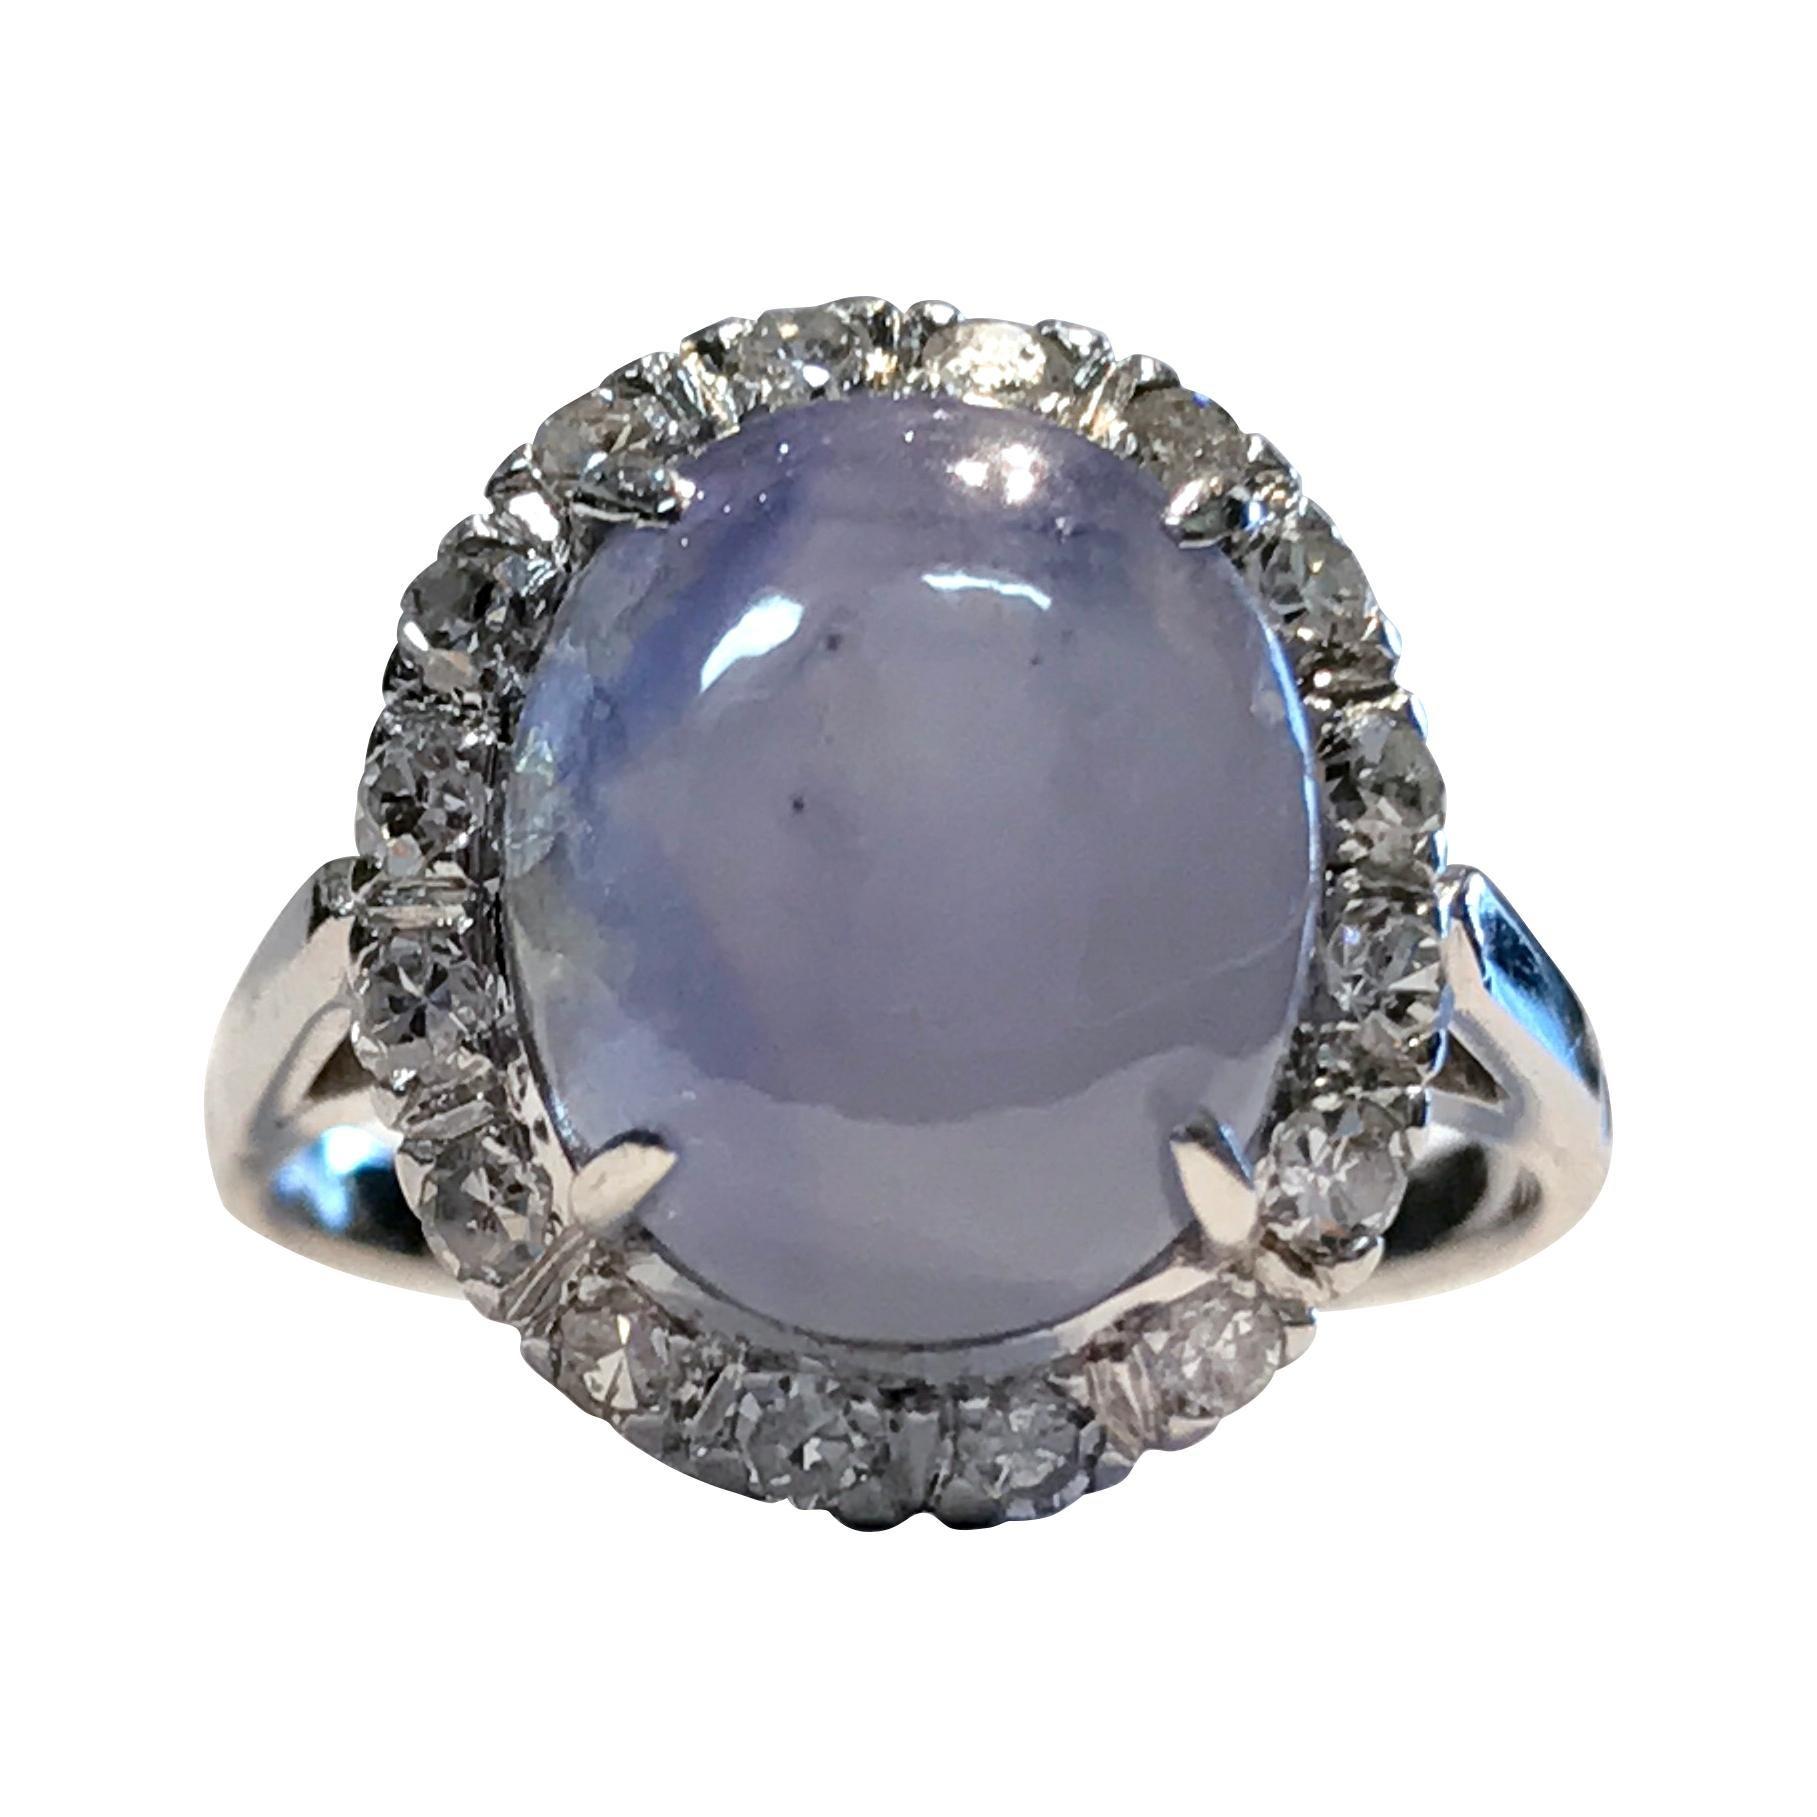 74ffa1aaf15be Vintage Star Sapphire with Diamond Halo, 0.32 Carat